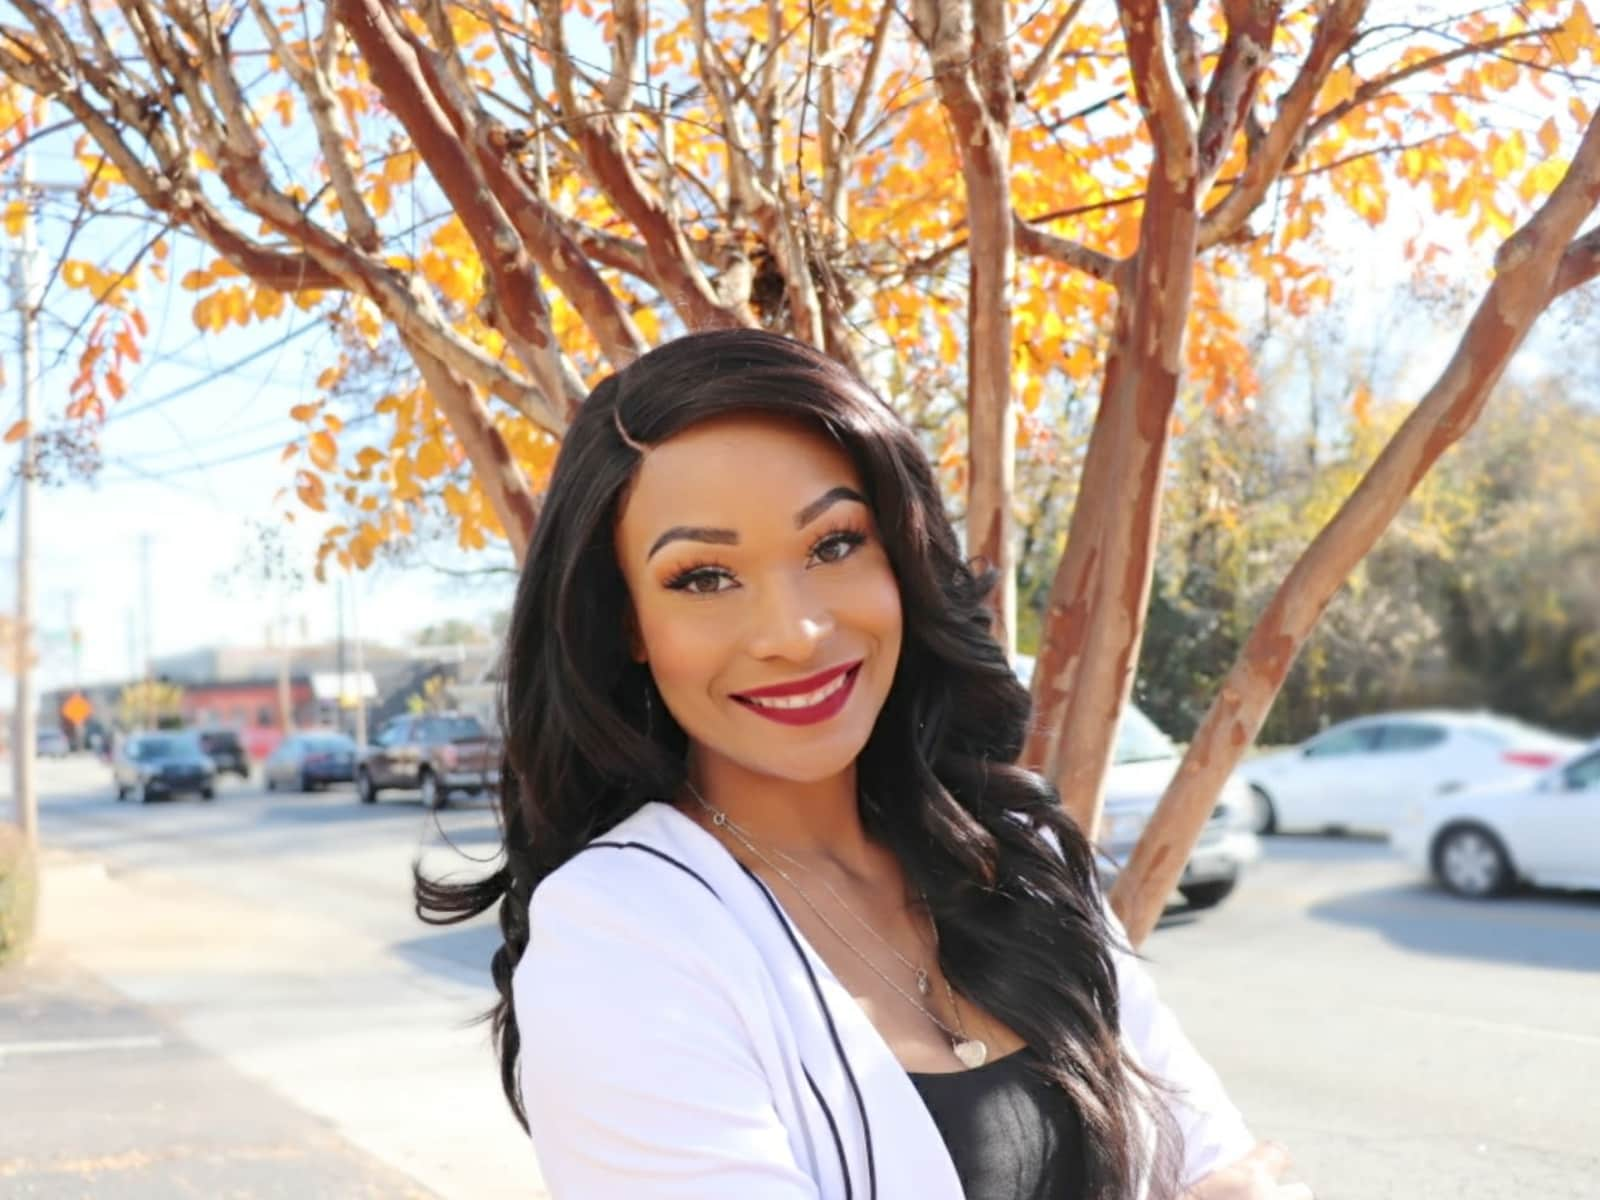 Lyvonne from Greenville, South Carolina, United States